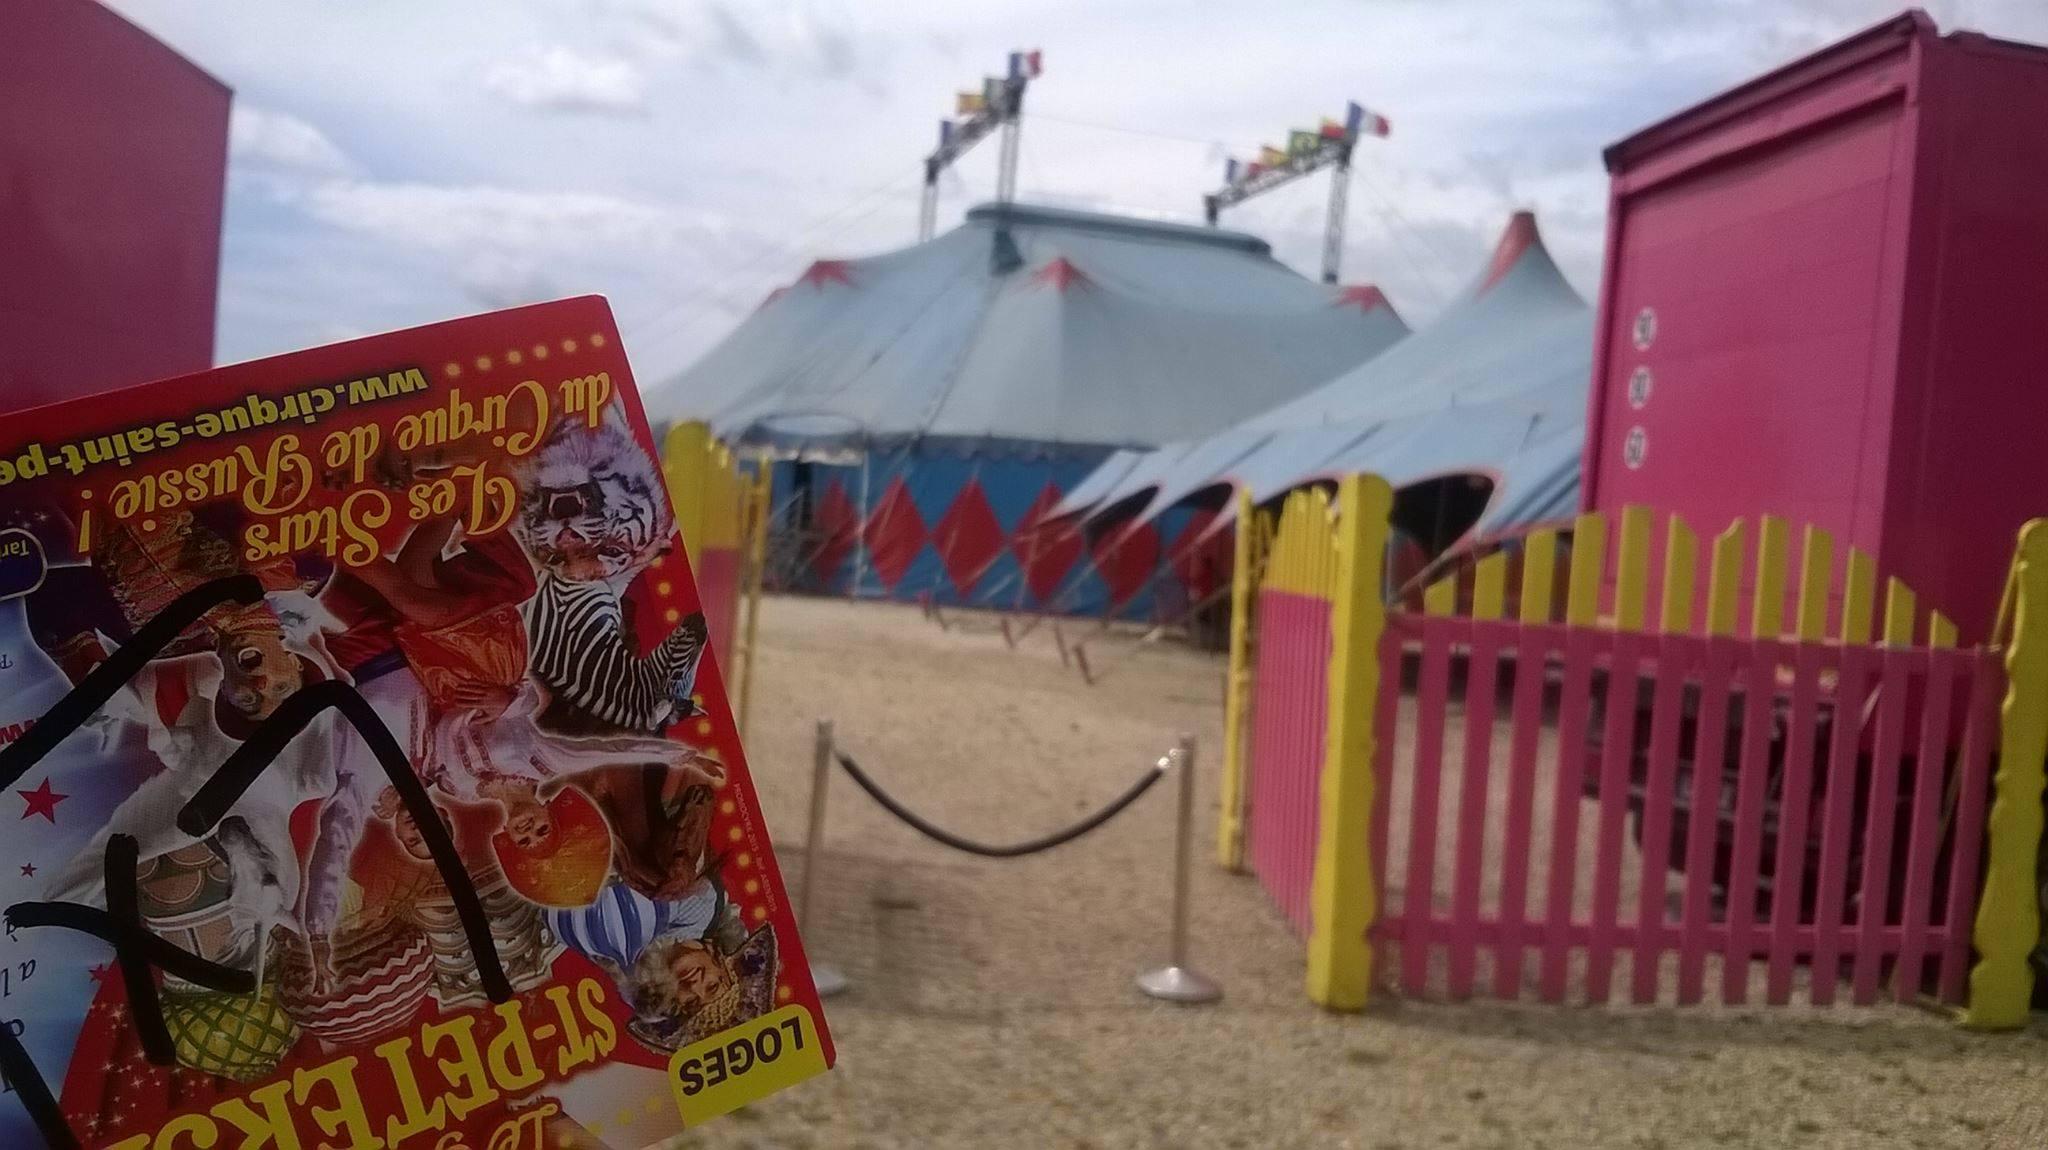 Cirque De Saint Petersbourg